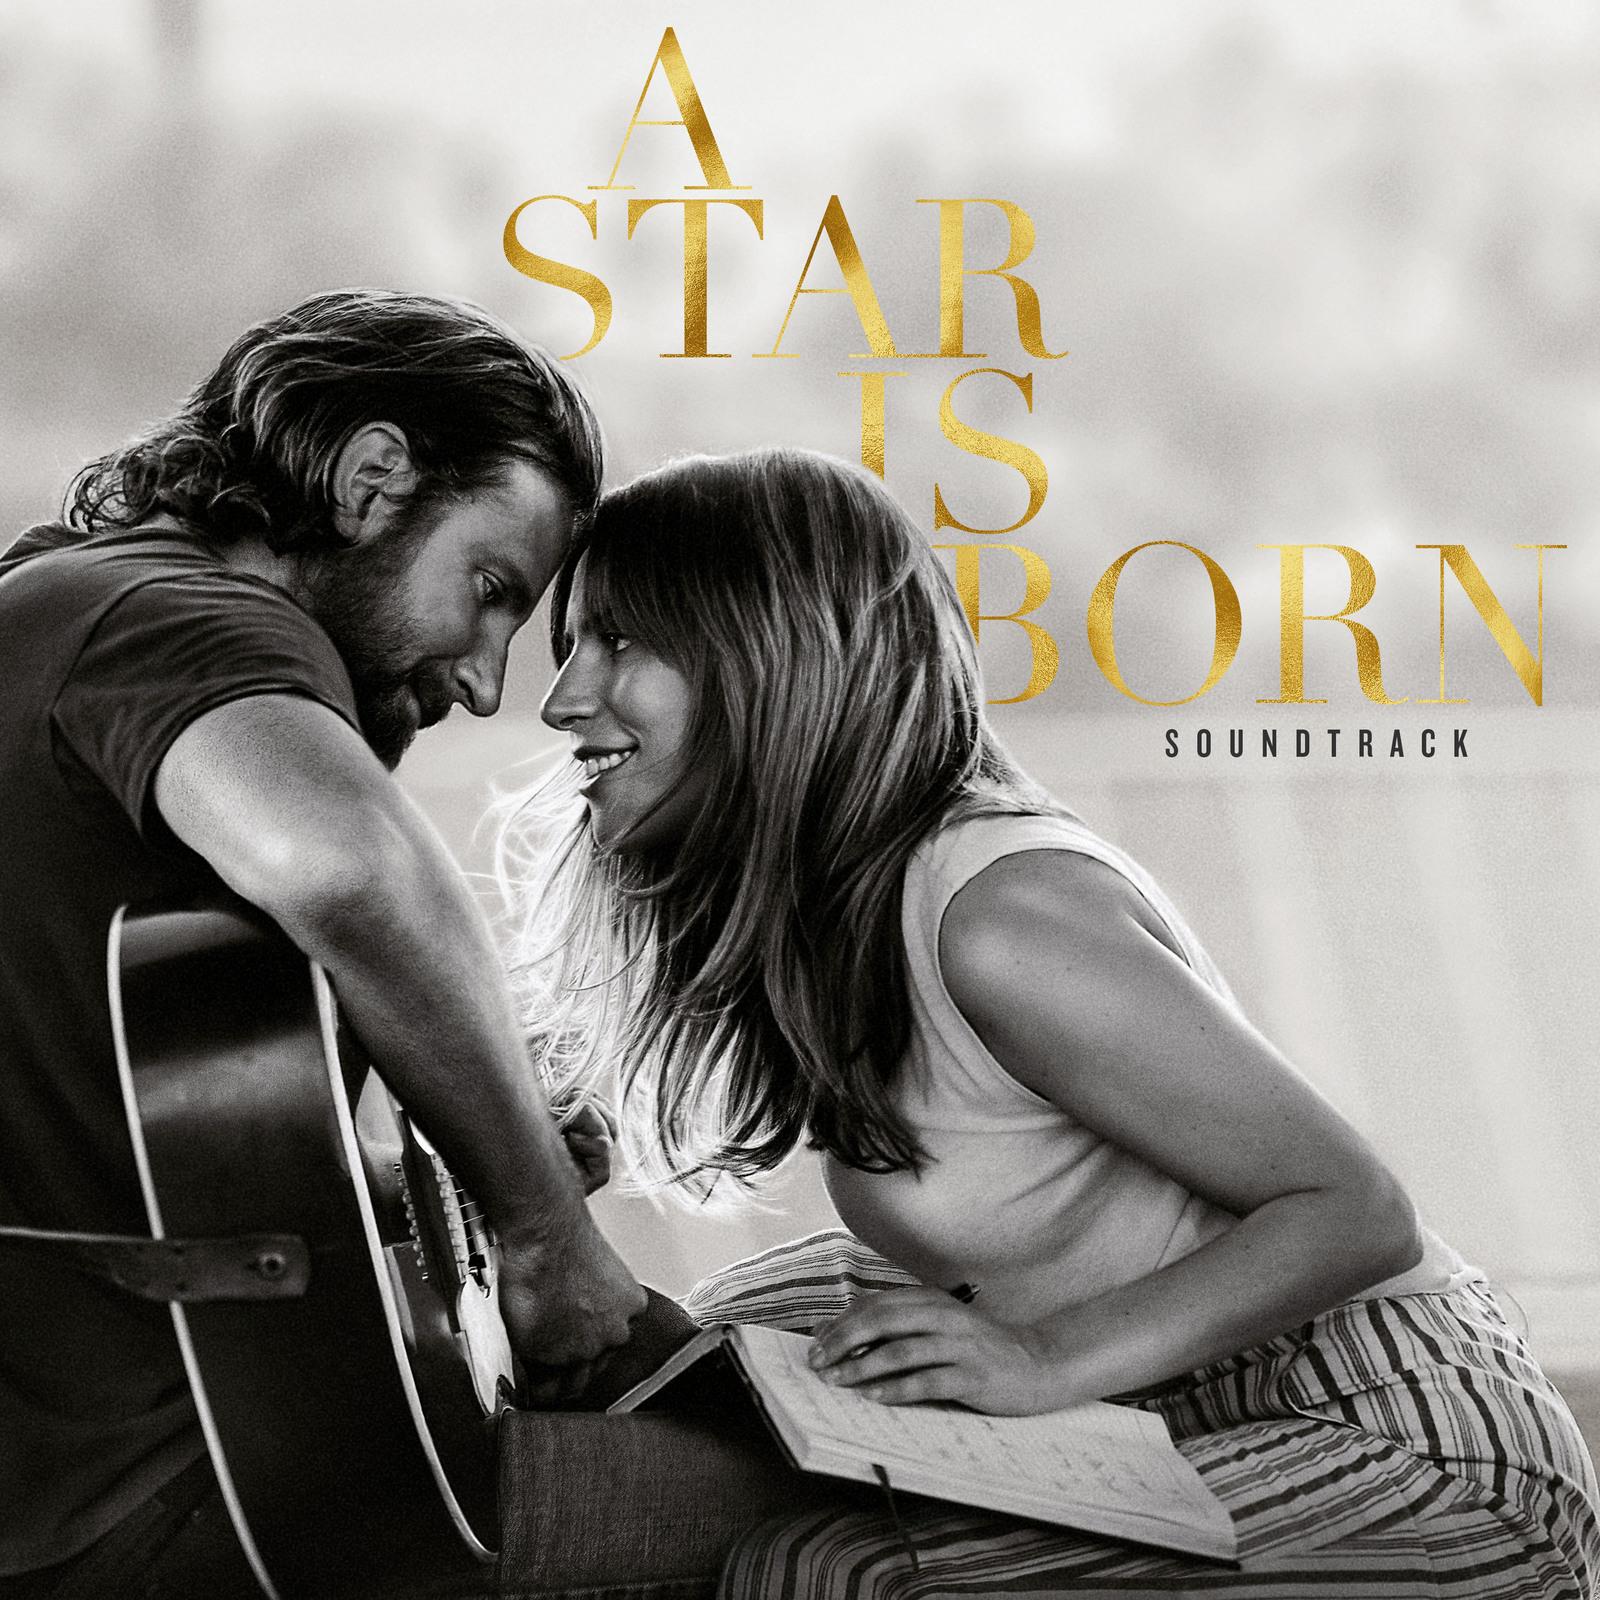 A Star Is Born by LADY GAGA & BRADLEY COOPER image